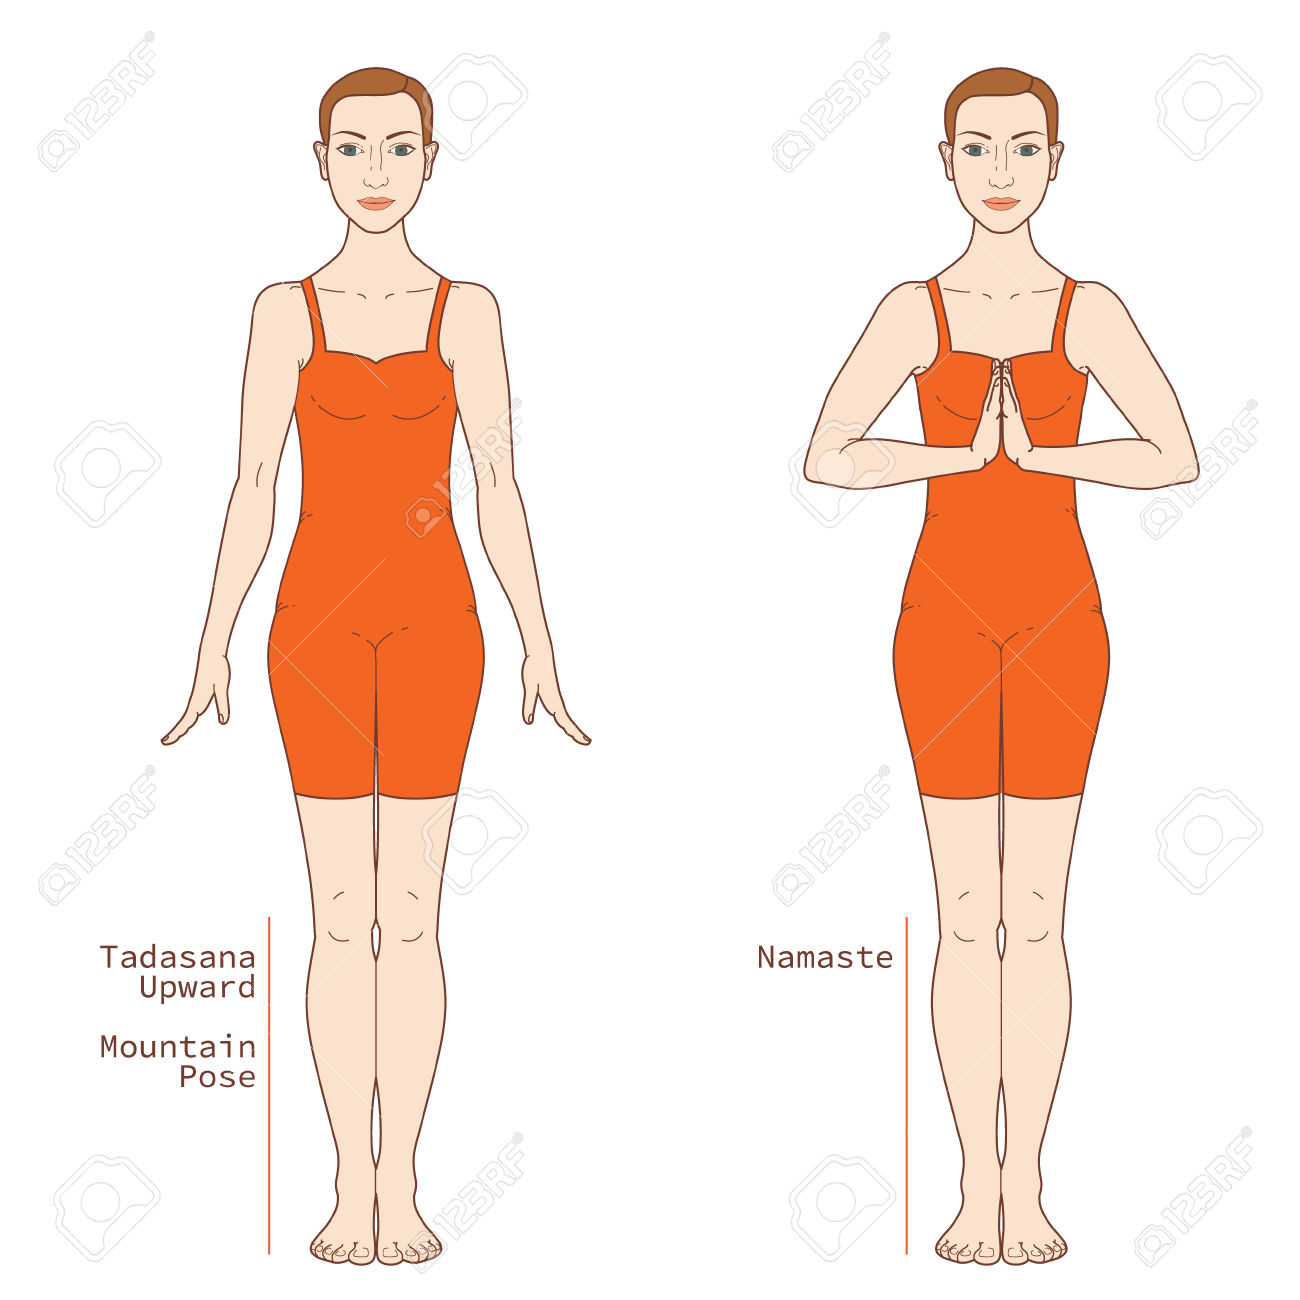 Tadasana Yoga Pose PNG - 60674